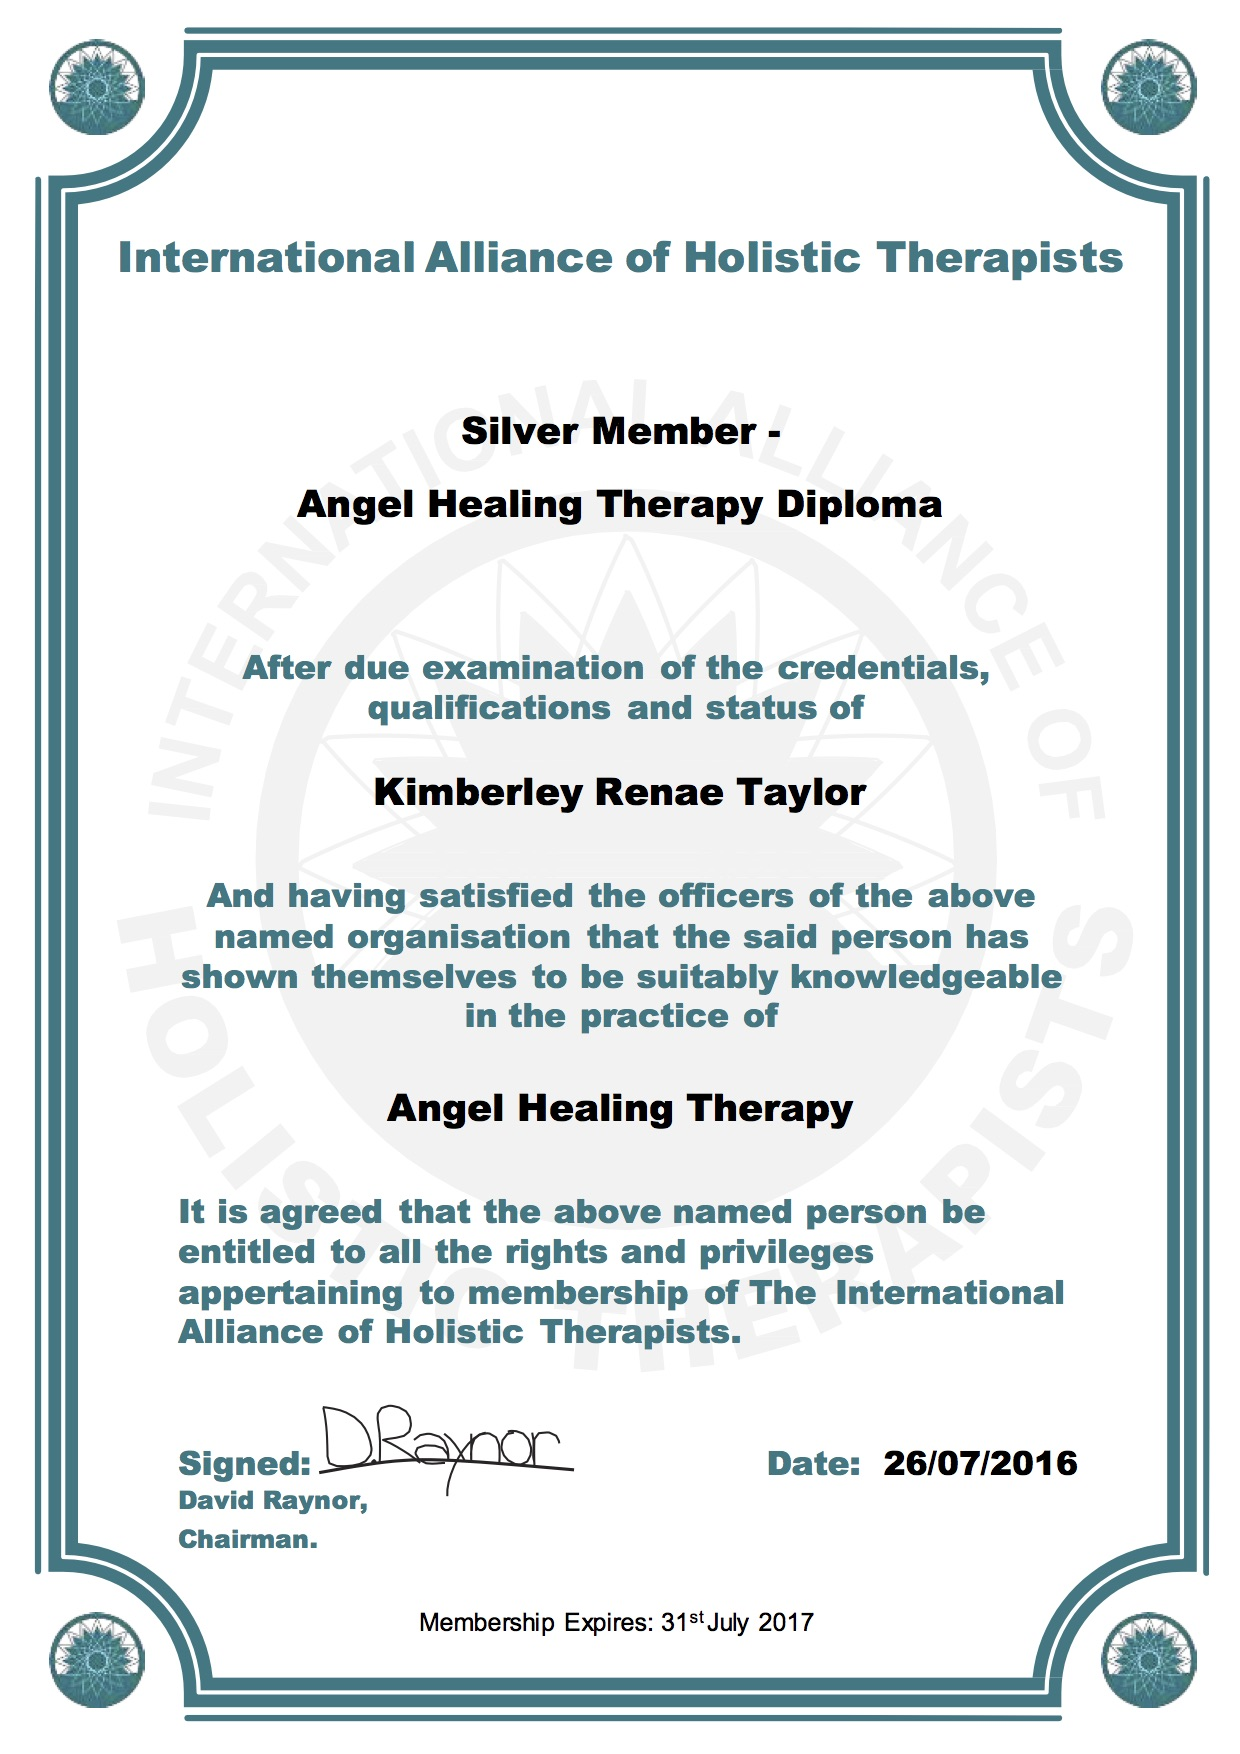 IAHT Silver Member Angel Healing Therapy Diploma Kimberley Renae Taylor